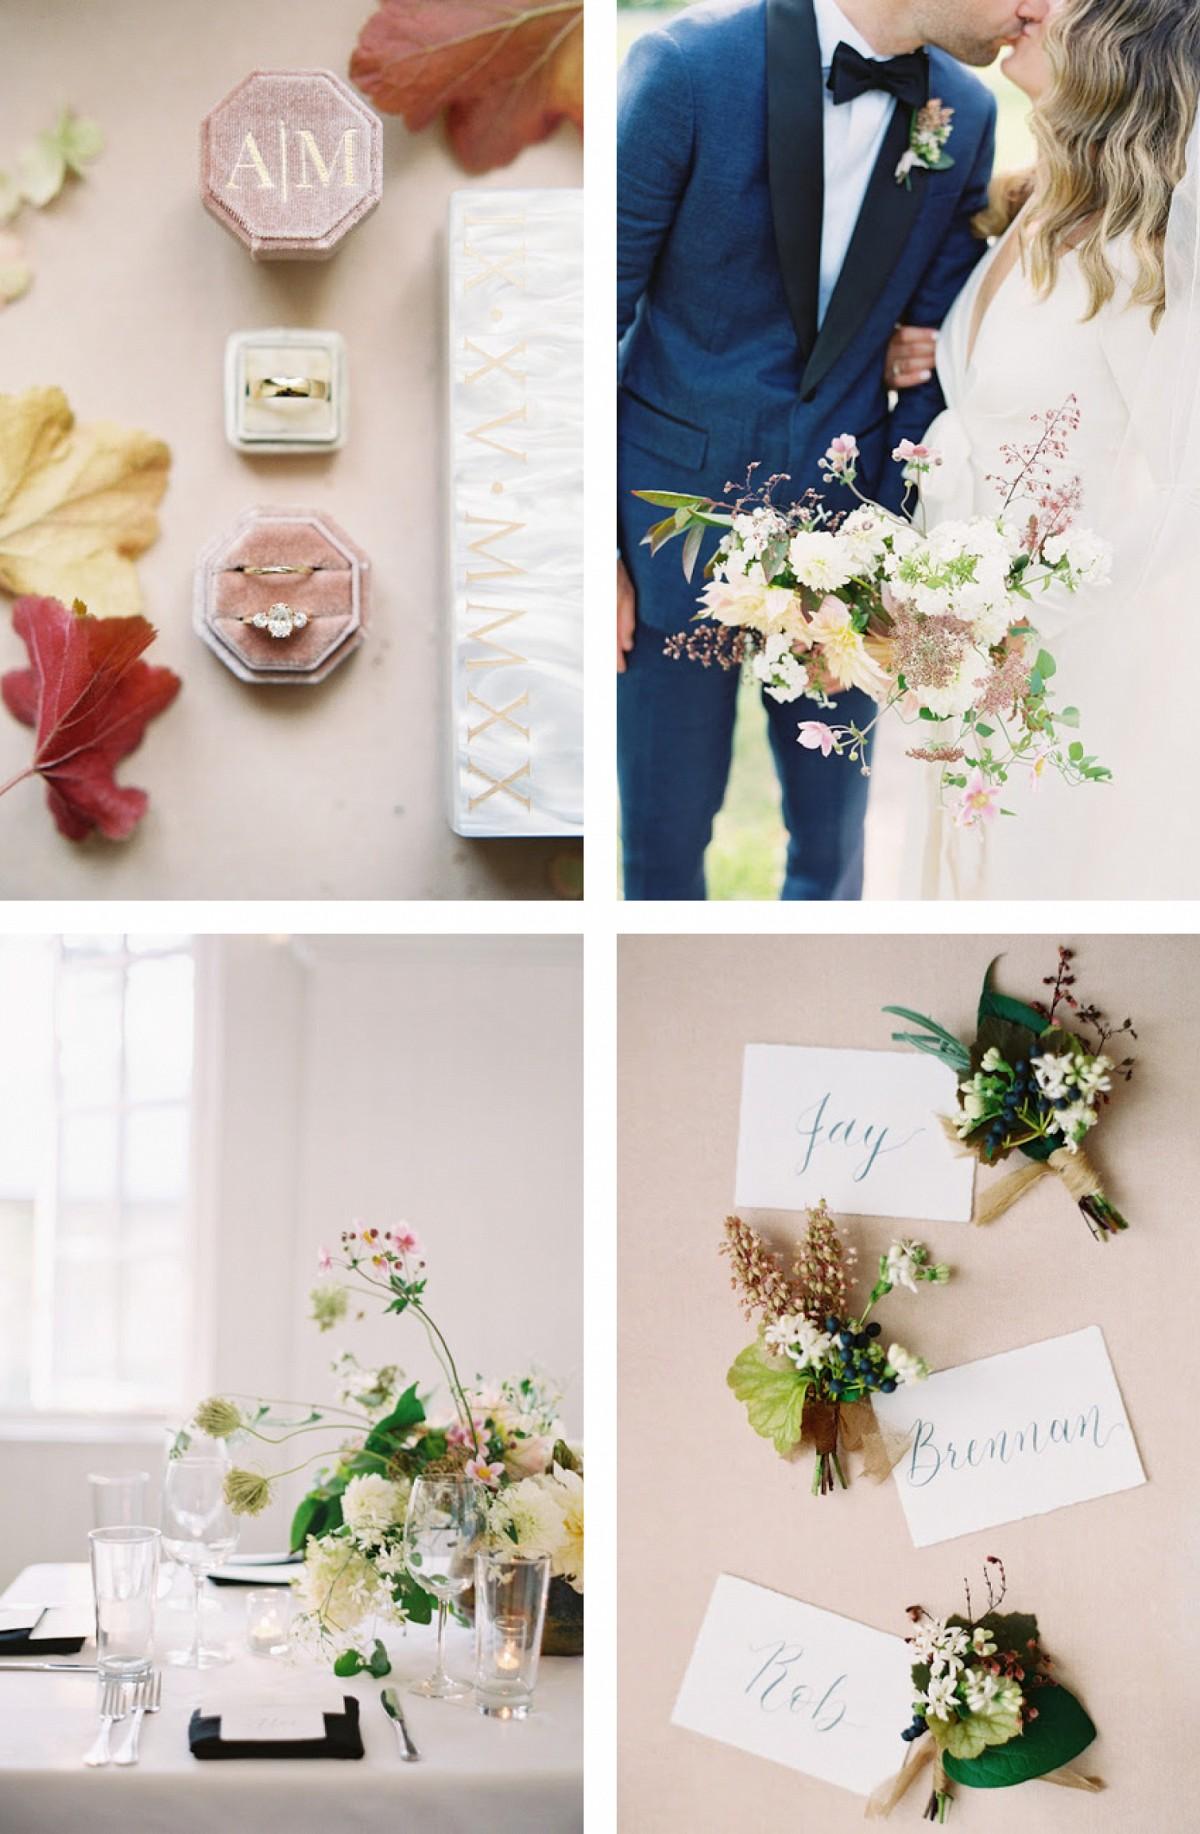 Krissy Campbell - Wedding Planner